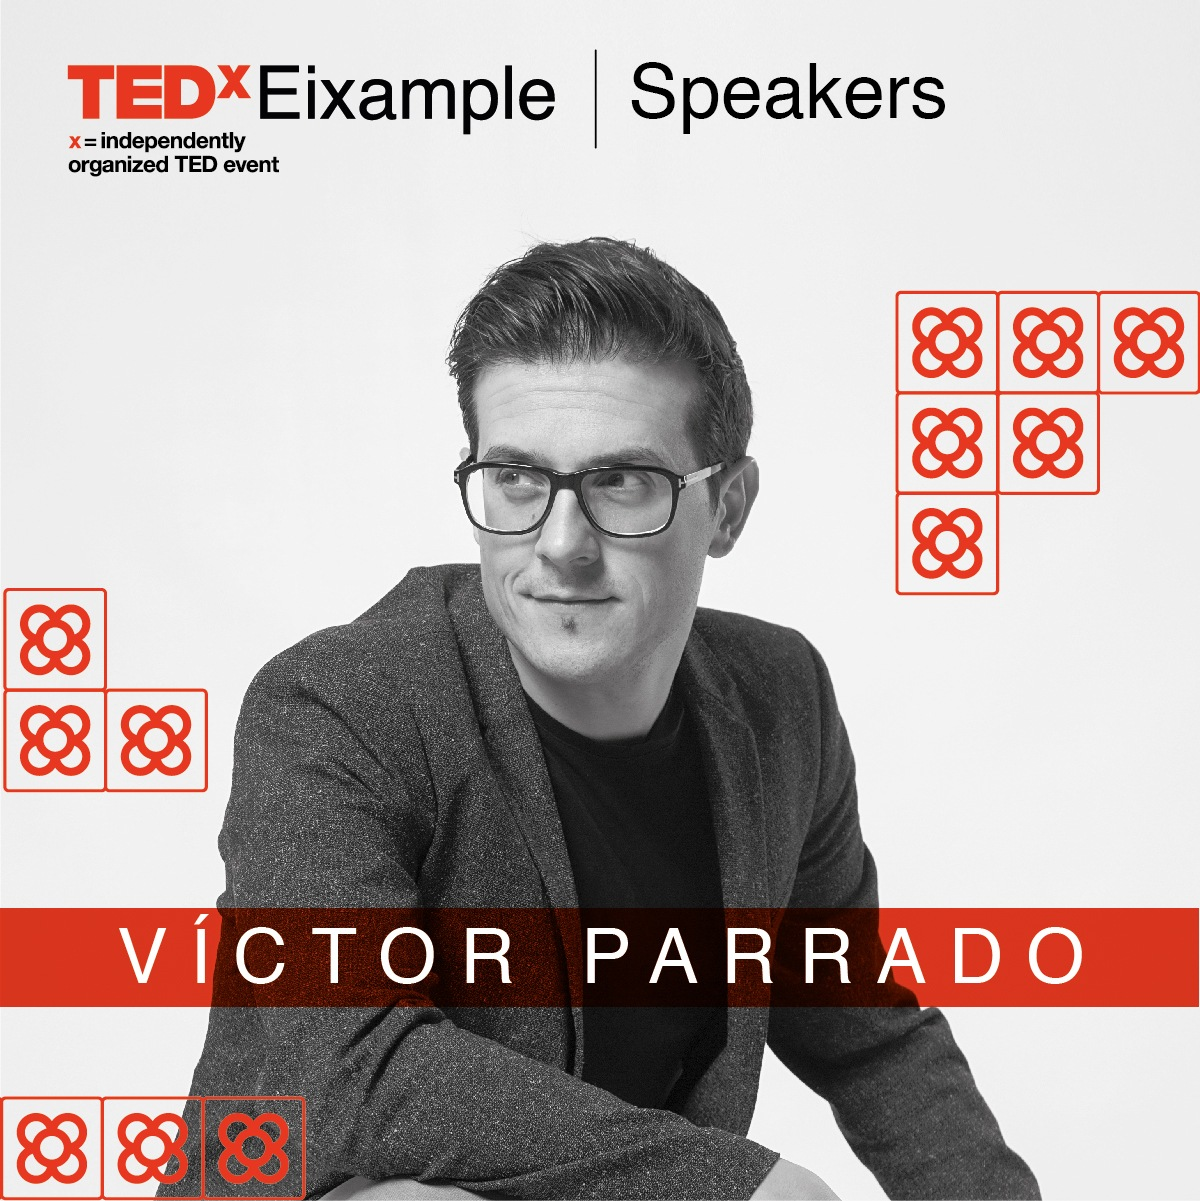 fb_Victor Parrado-TEDxEixample